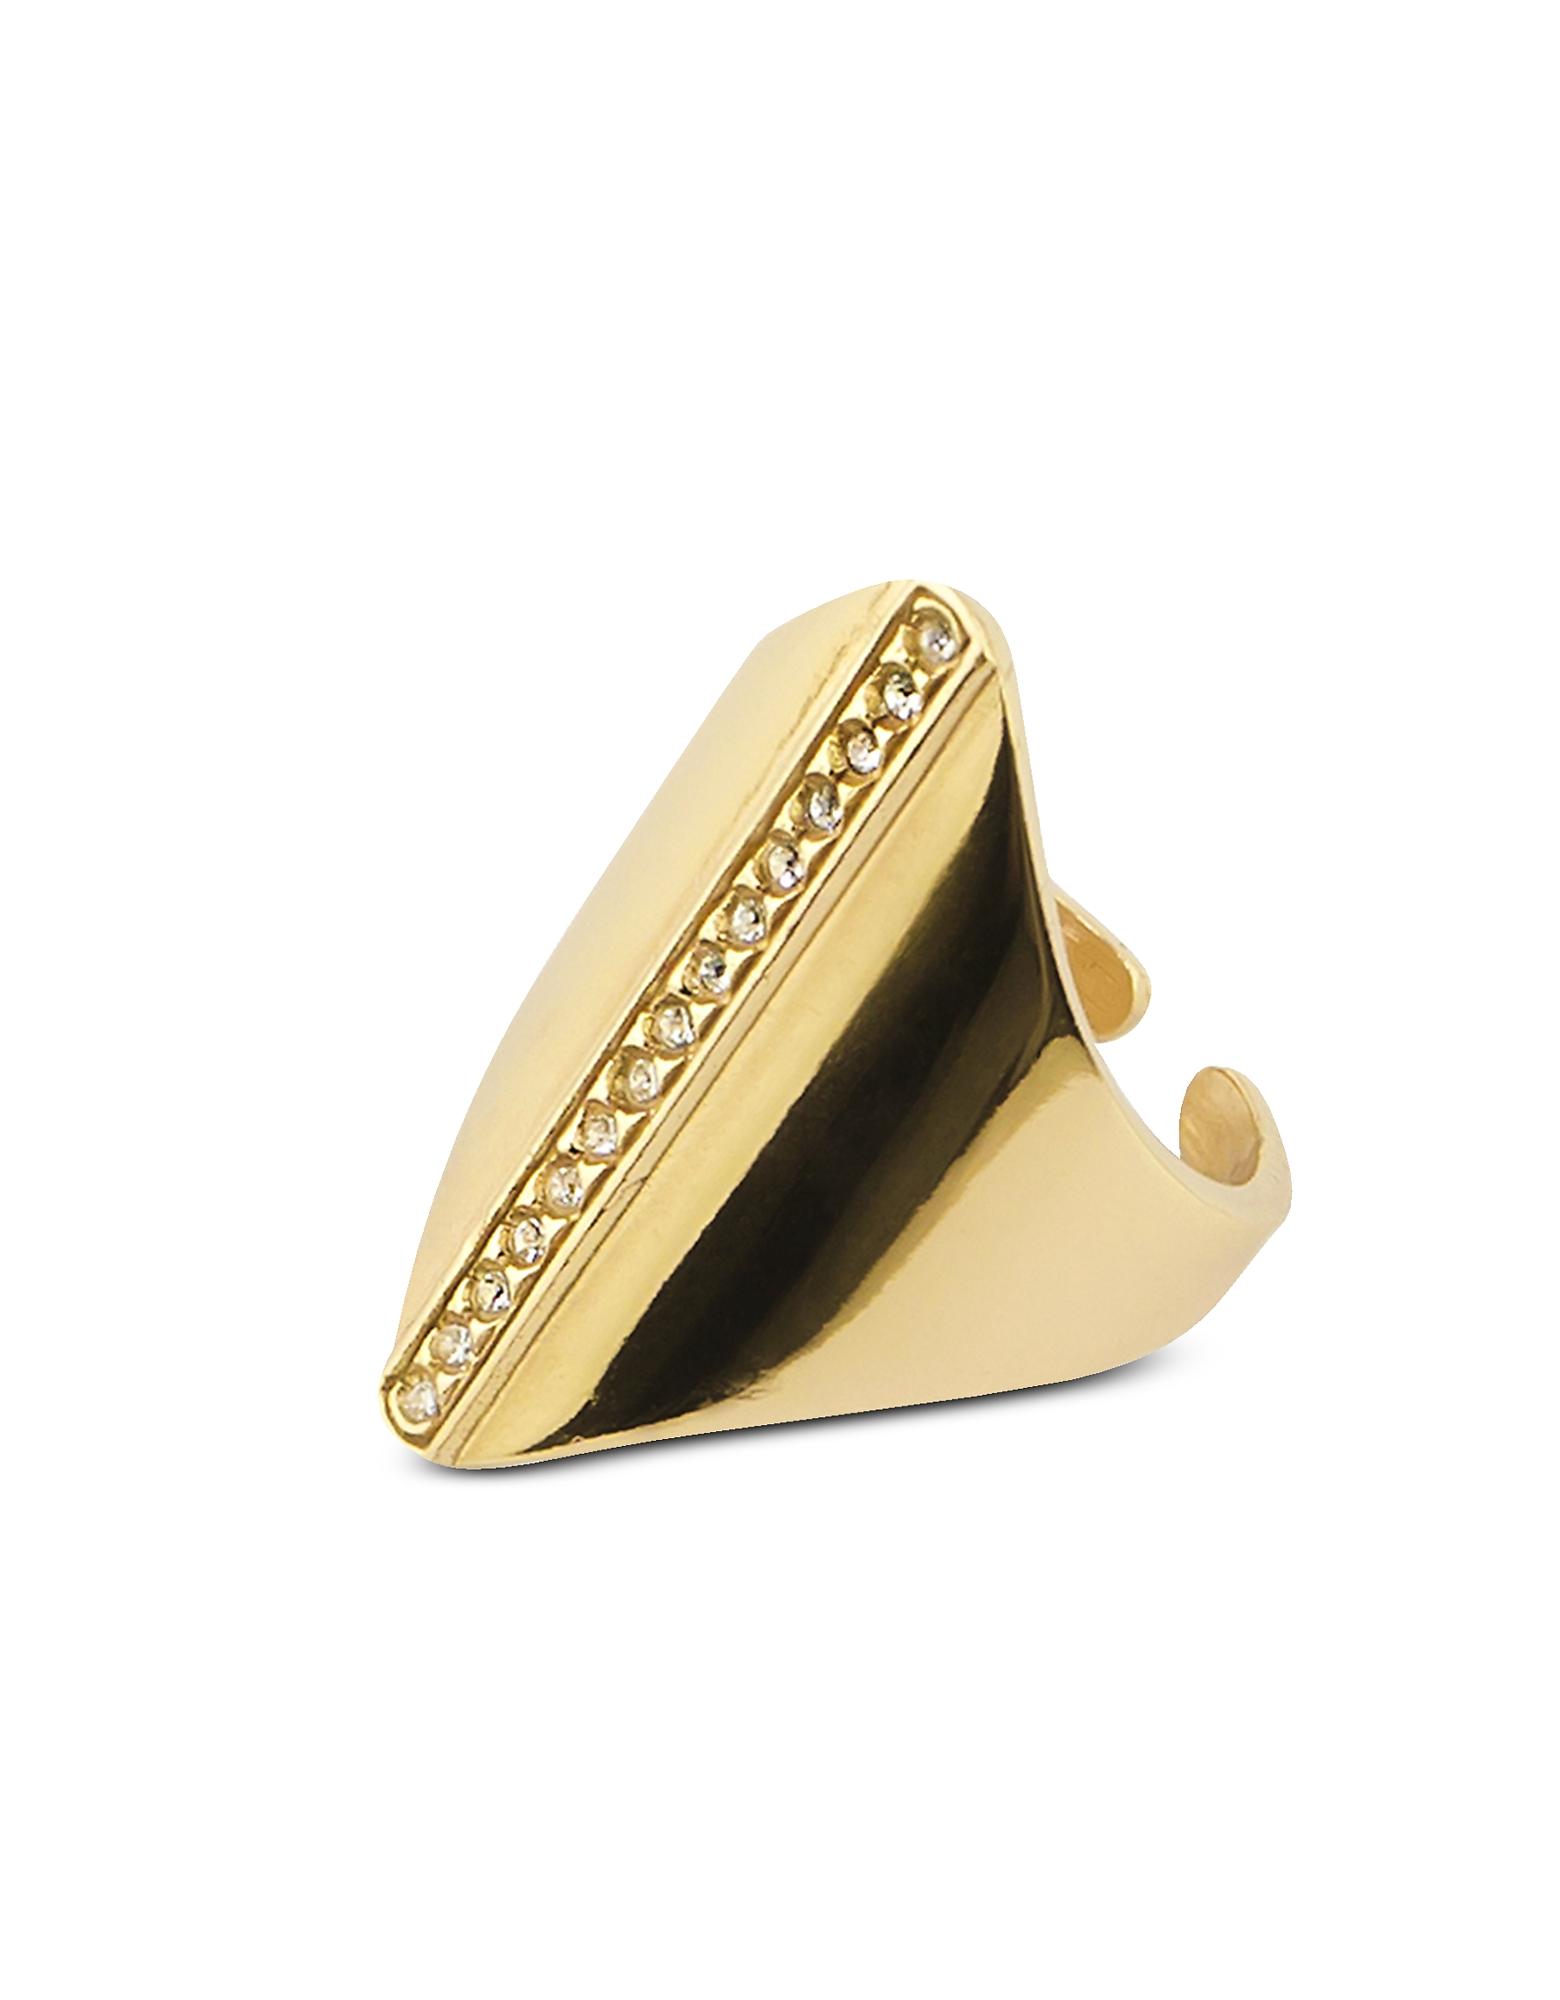 Federica Tosi Rings, Polygon Ring